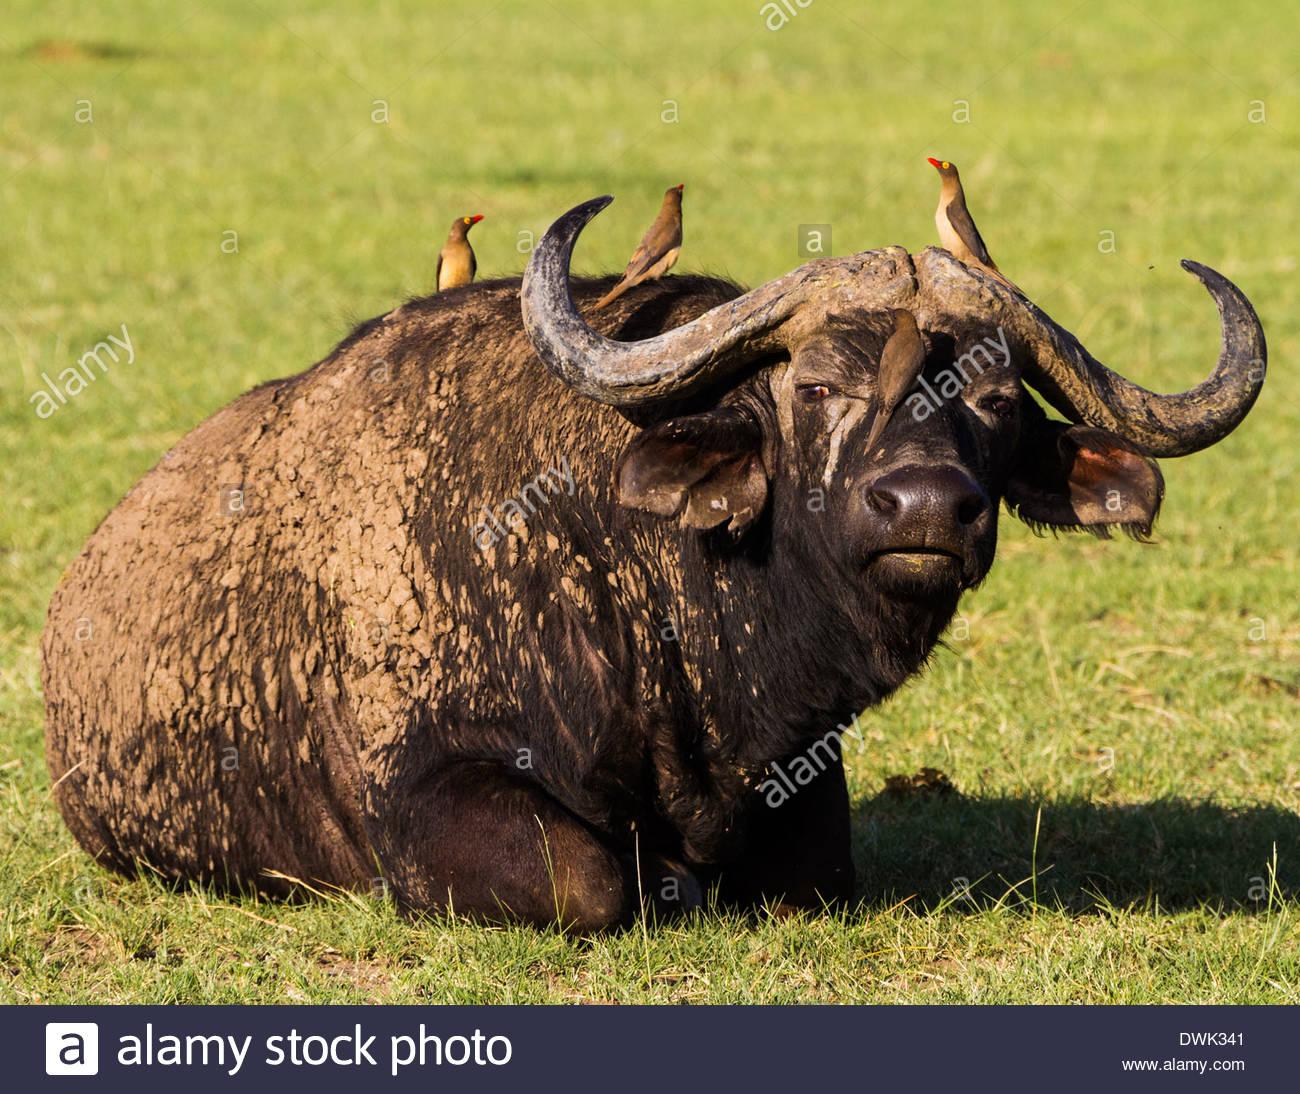 Birds perching on african buffalo - East Africa - Tanzania - Stock Image